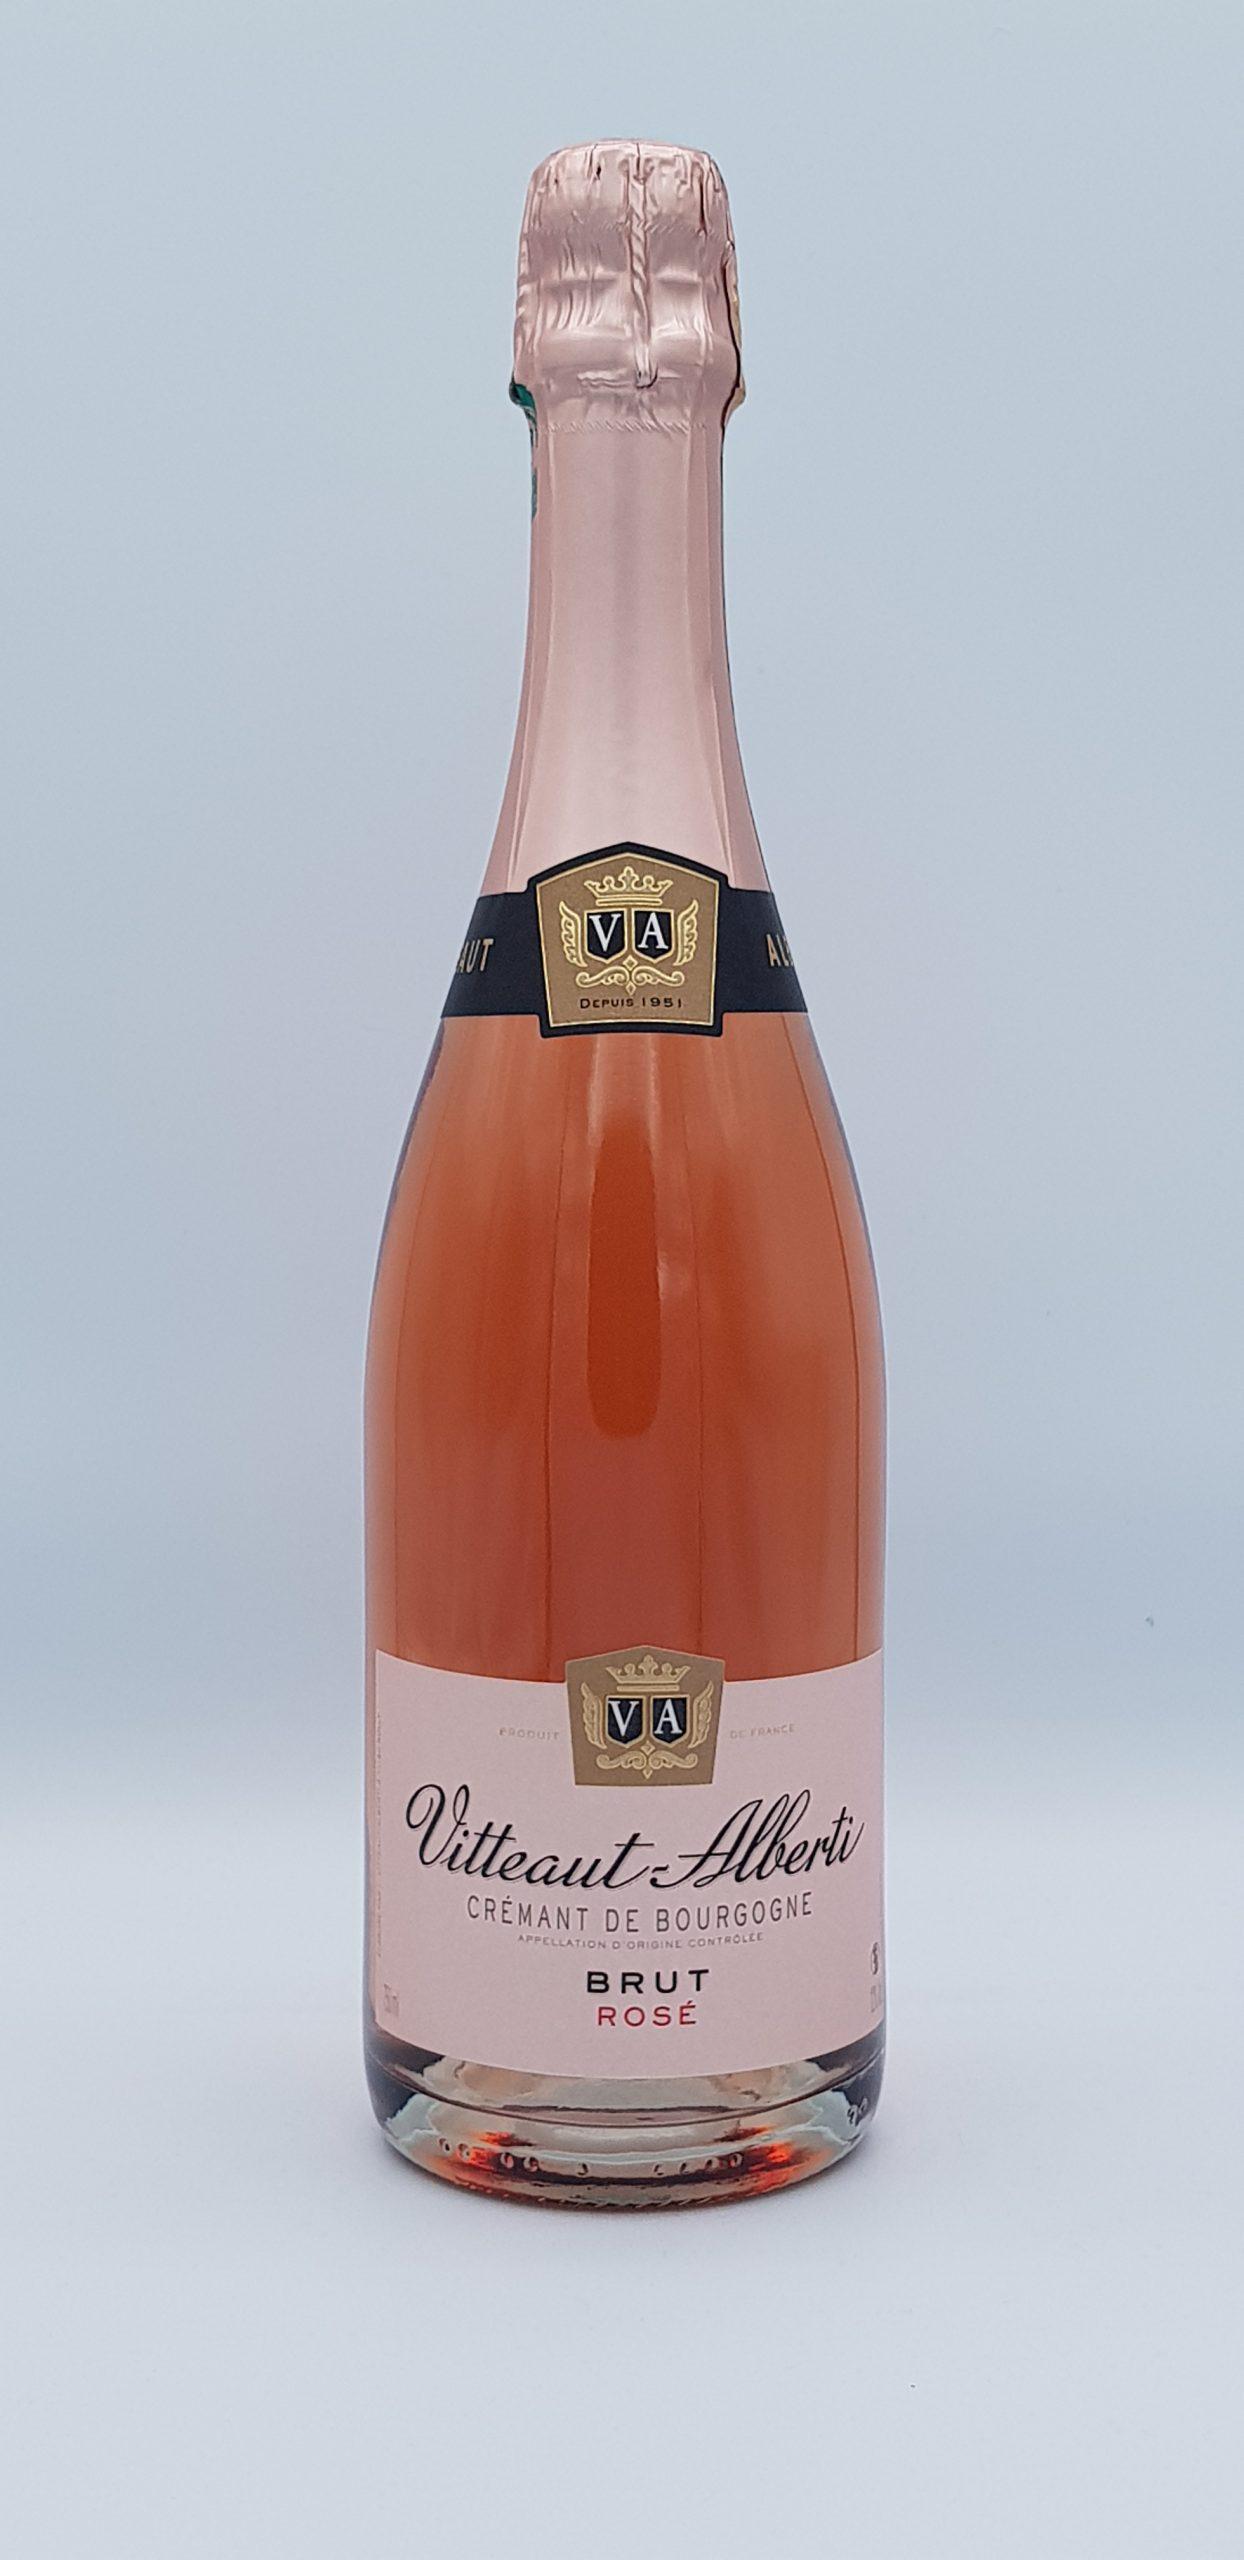 Cremant De Bourgogne Brut Rose Vitteaut Alberti